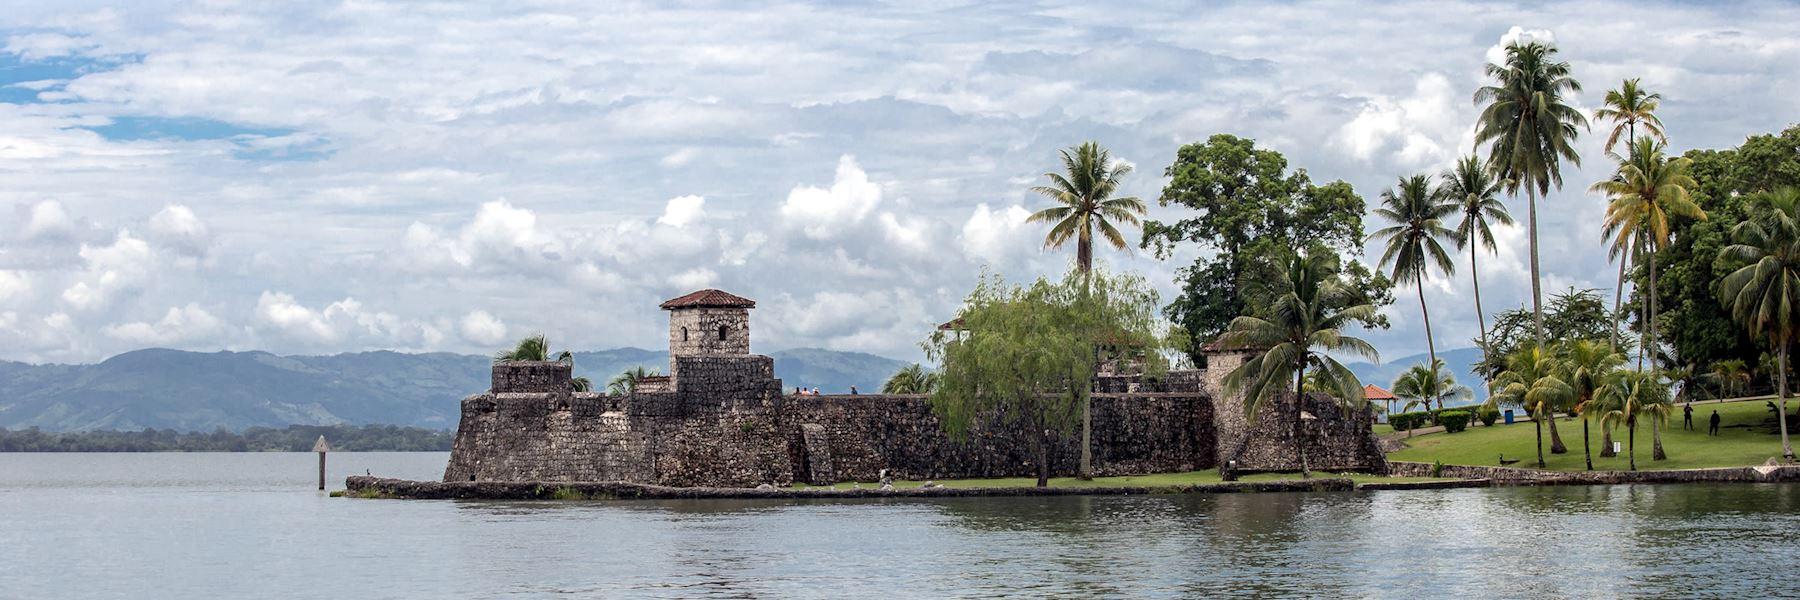 Visit Rio Dulce & Livingston, Guatemala